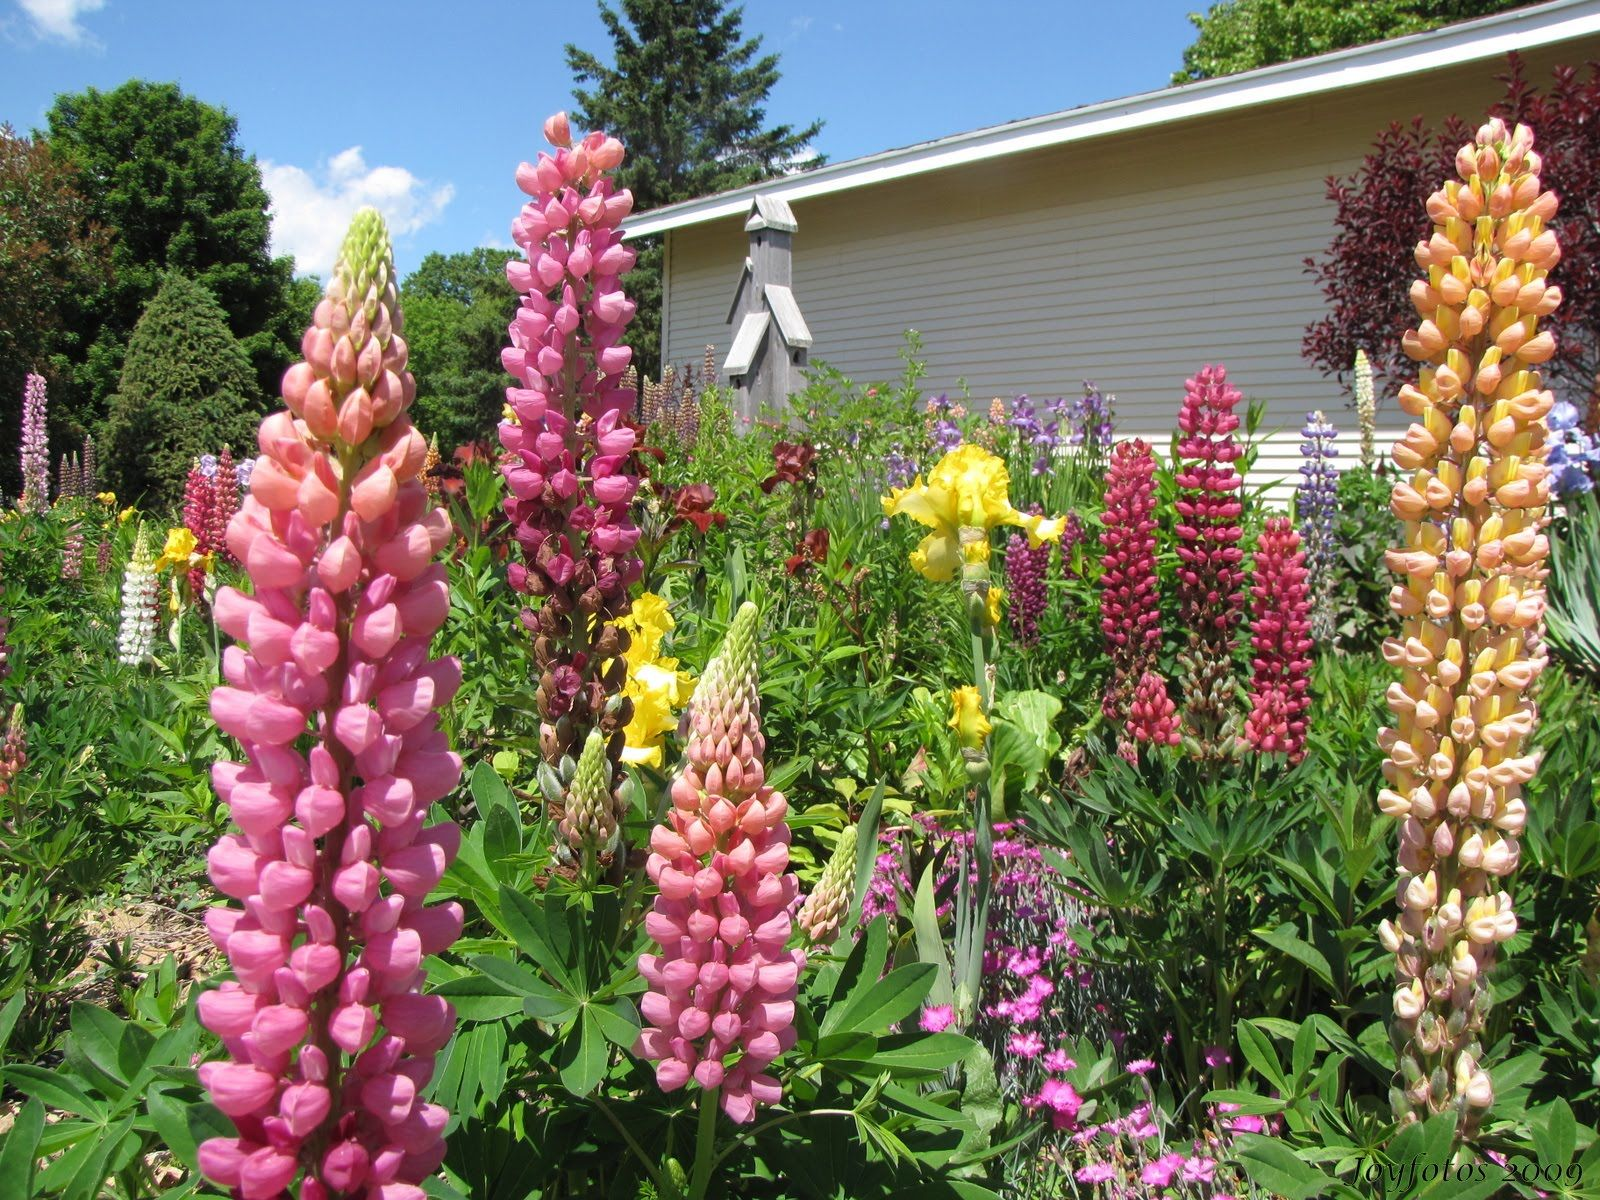 Lupine flower garden ideas pinterest for Garden designs pinterest